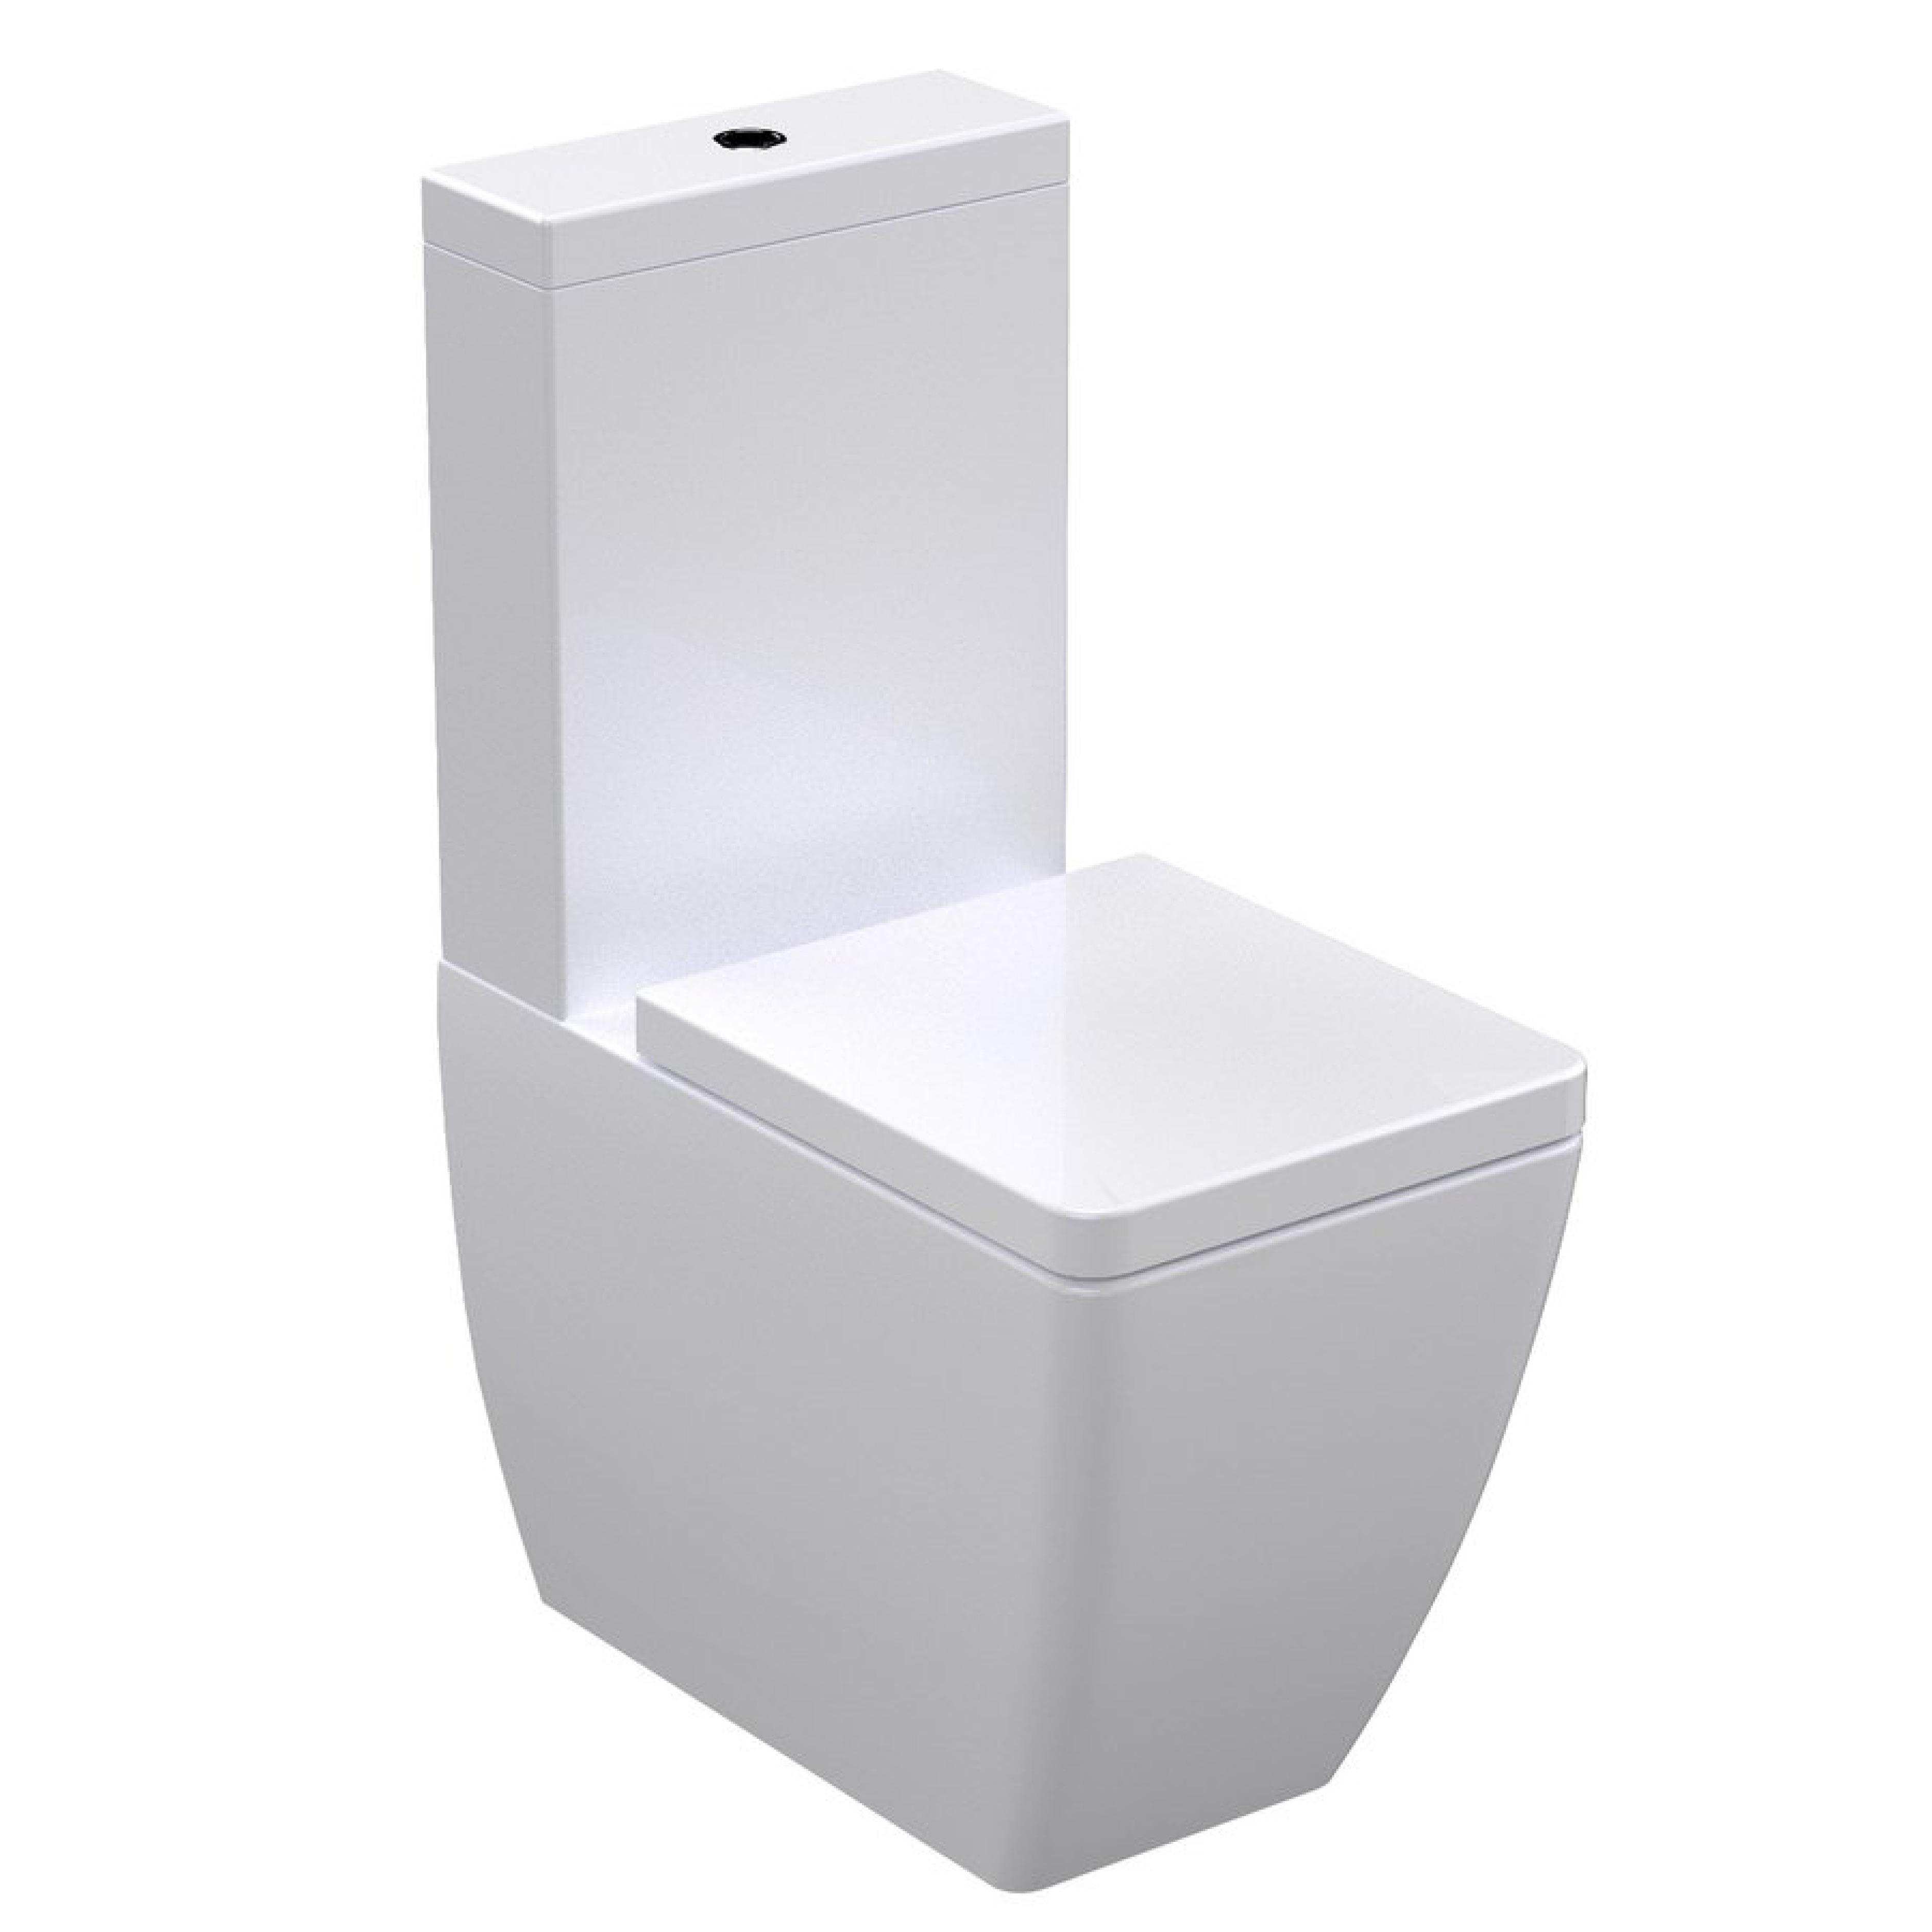 wc poser 36x60cm ego 321701 aquabains. Black Bedroom Furniture Sets. Home Design Ideas